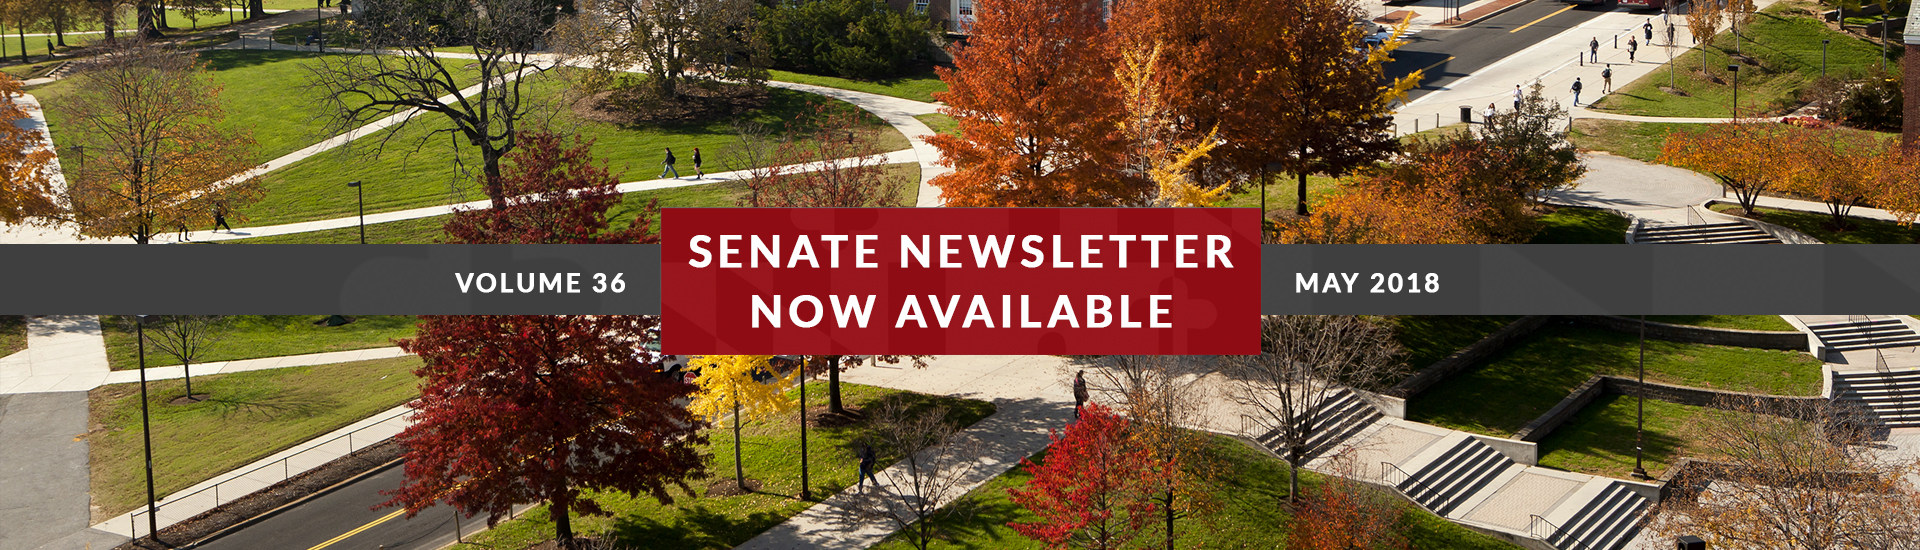 may 2018 senate newsletter